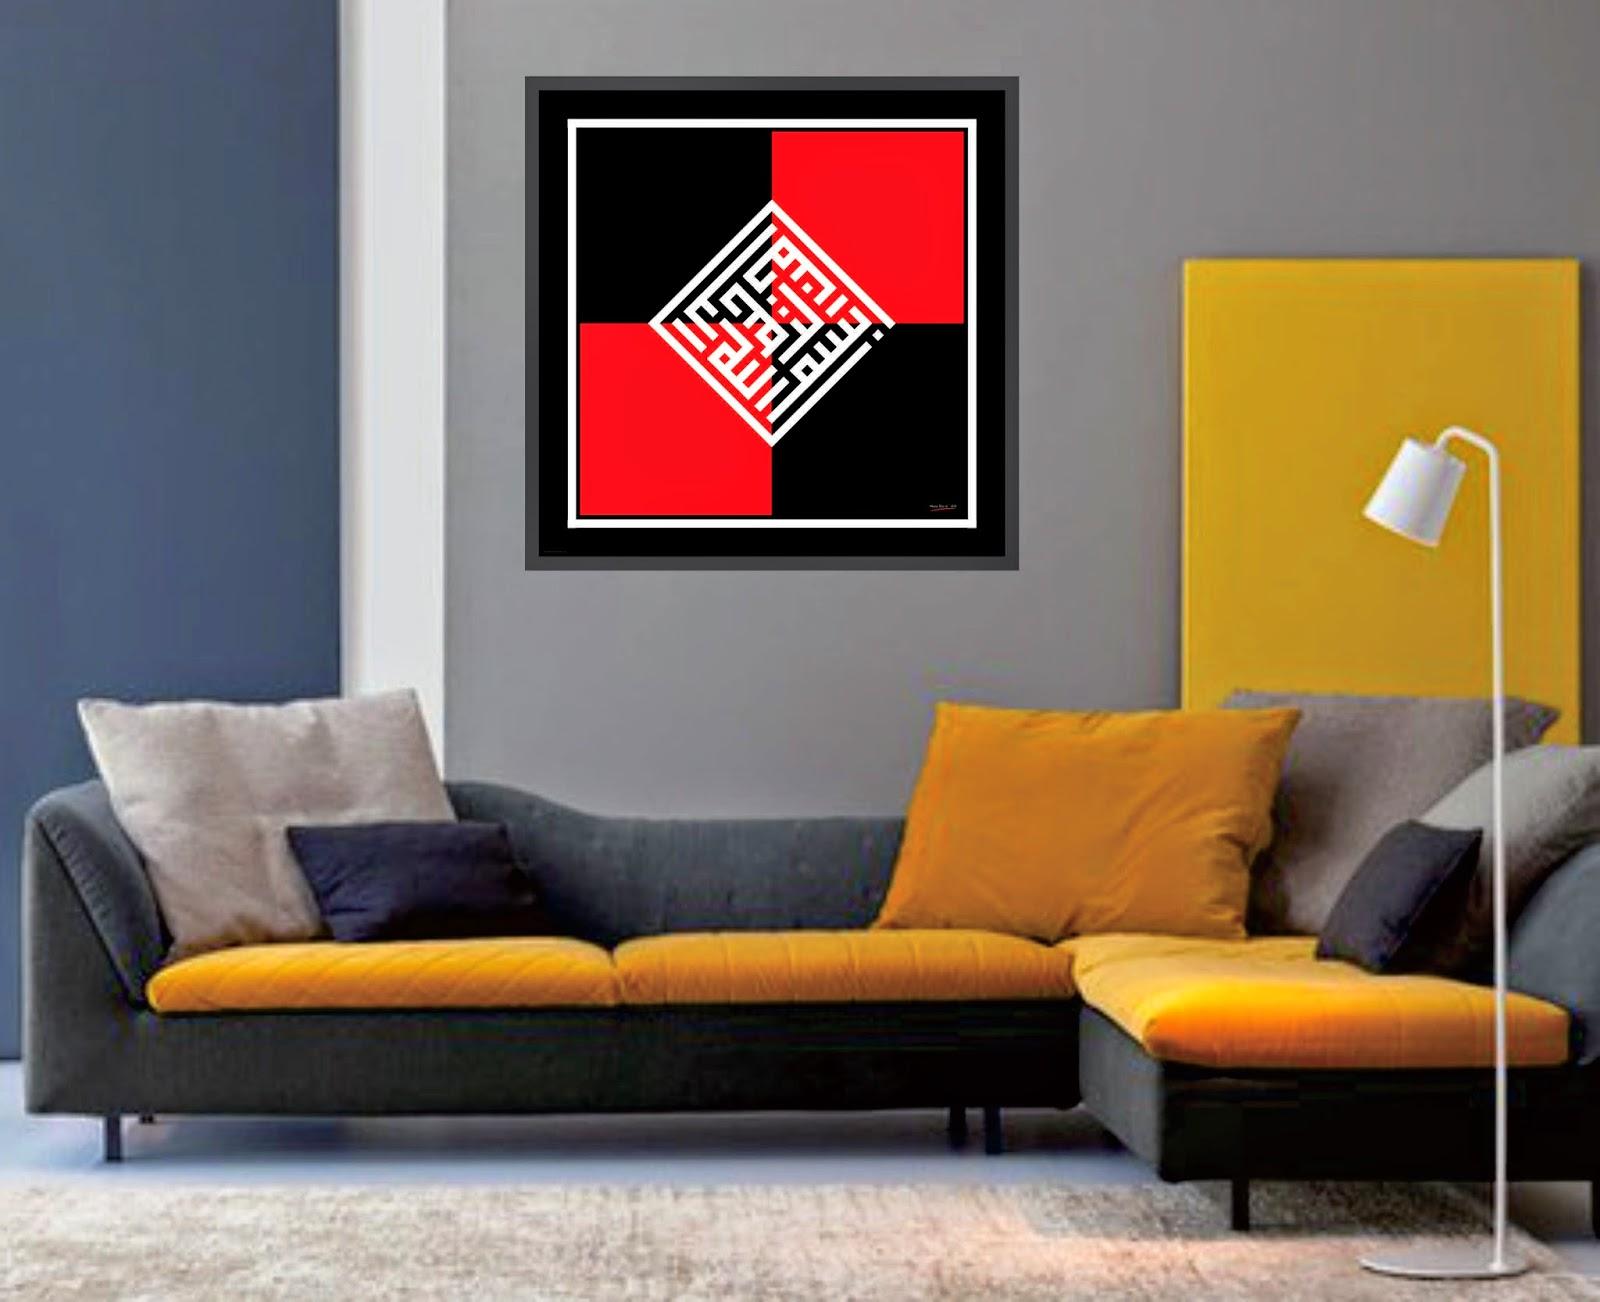 Hiasan dinding ruang tamu kecil dengan seni kufi